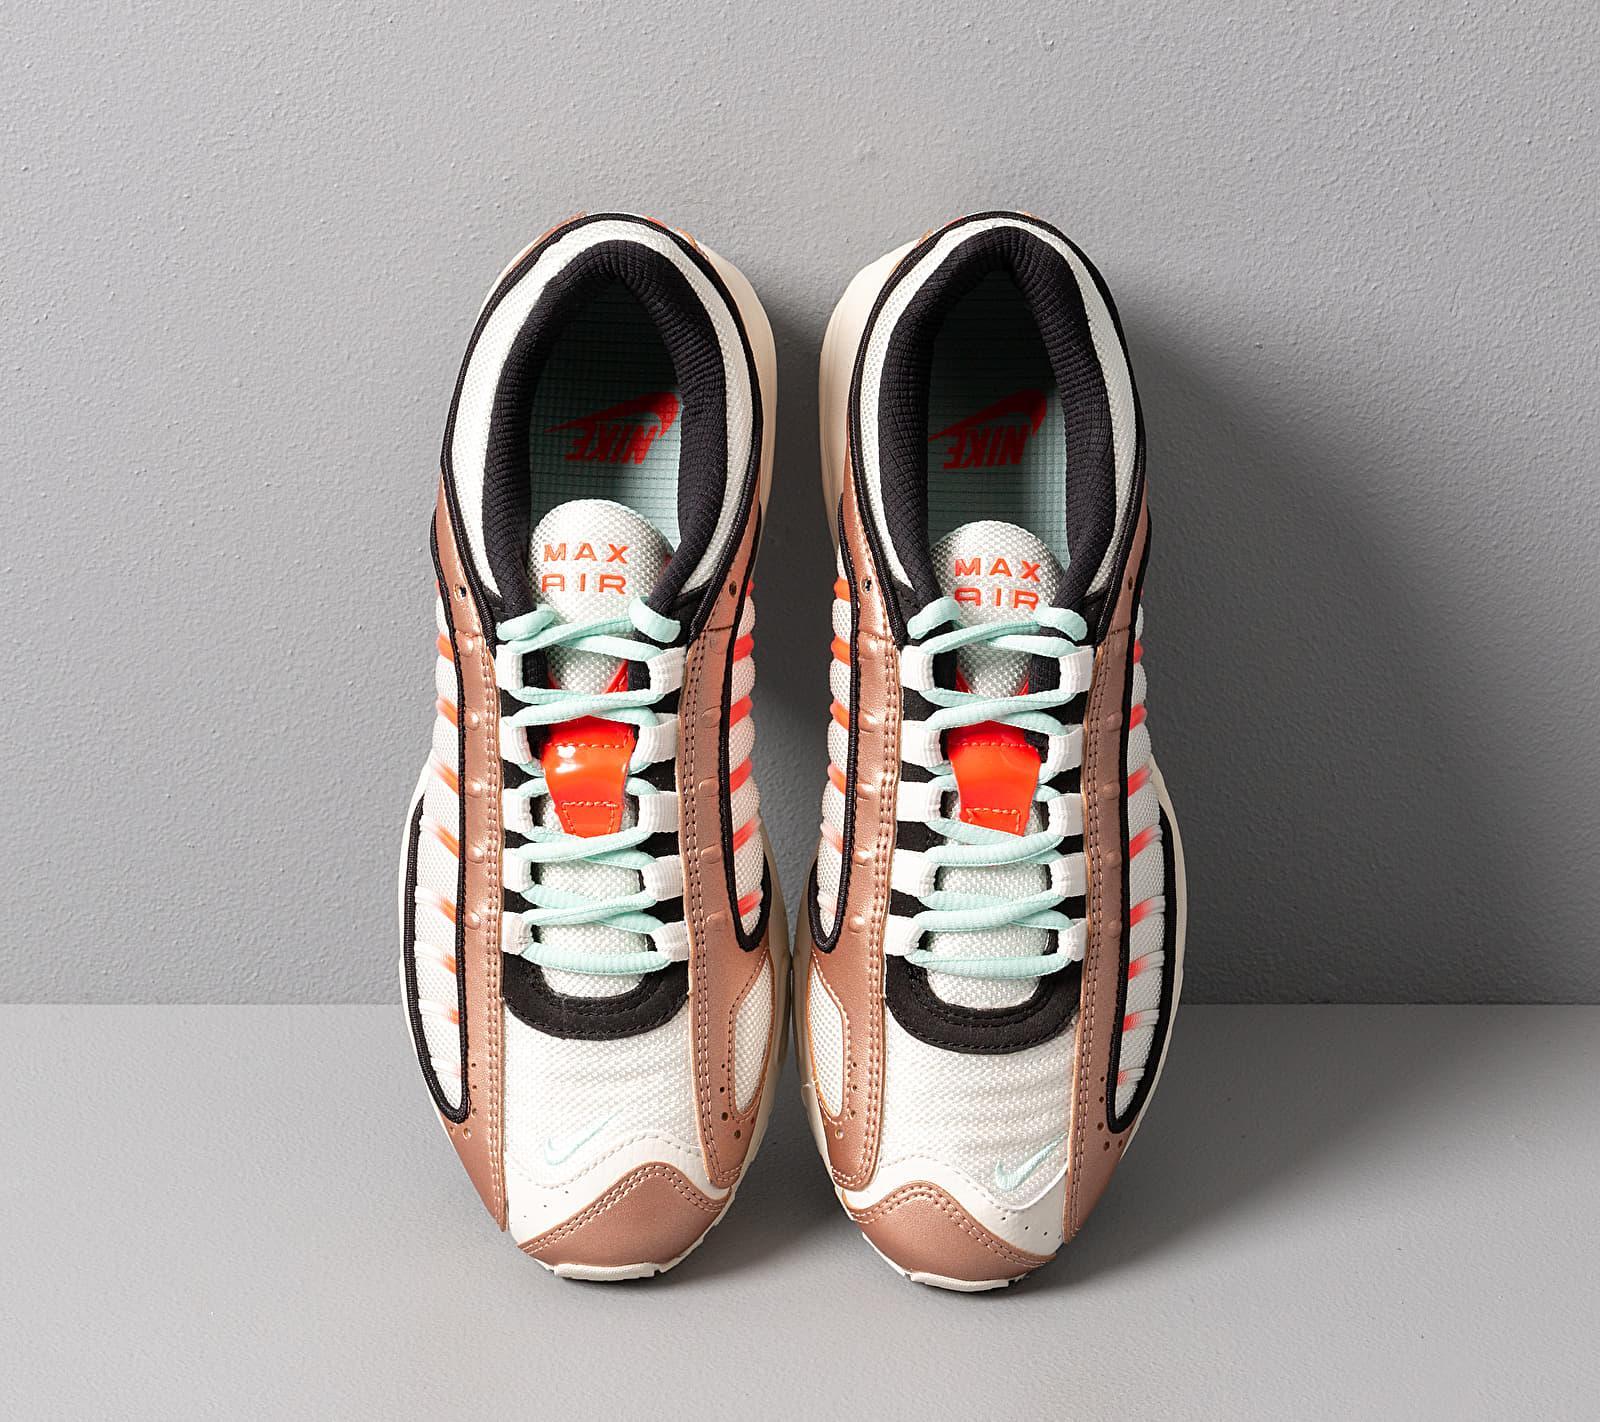 Wmns Air Max Tailwind Iv Mtlc Red Bronze/ Teal Tint-Pure Platinum Nike